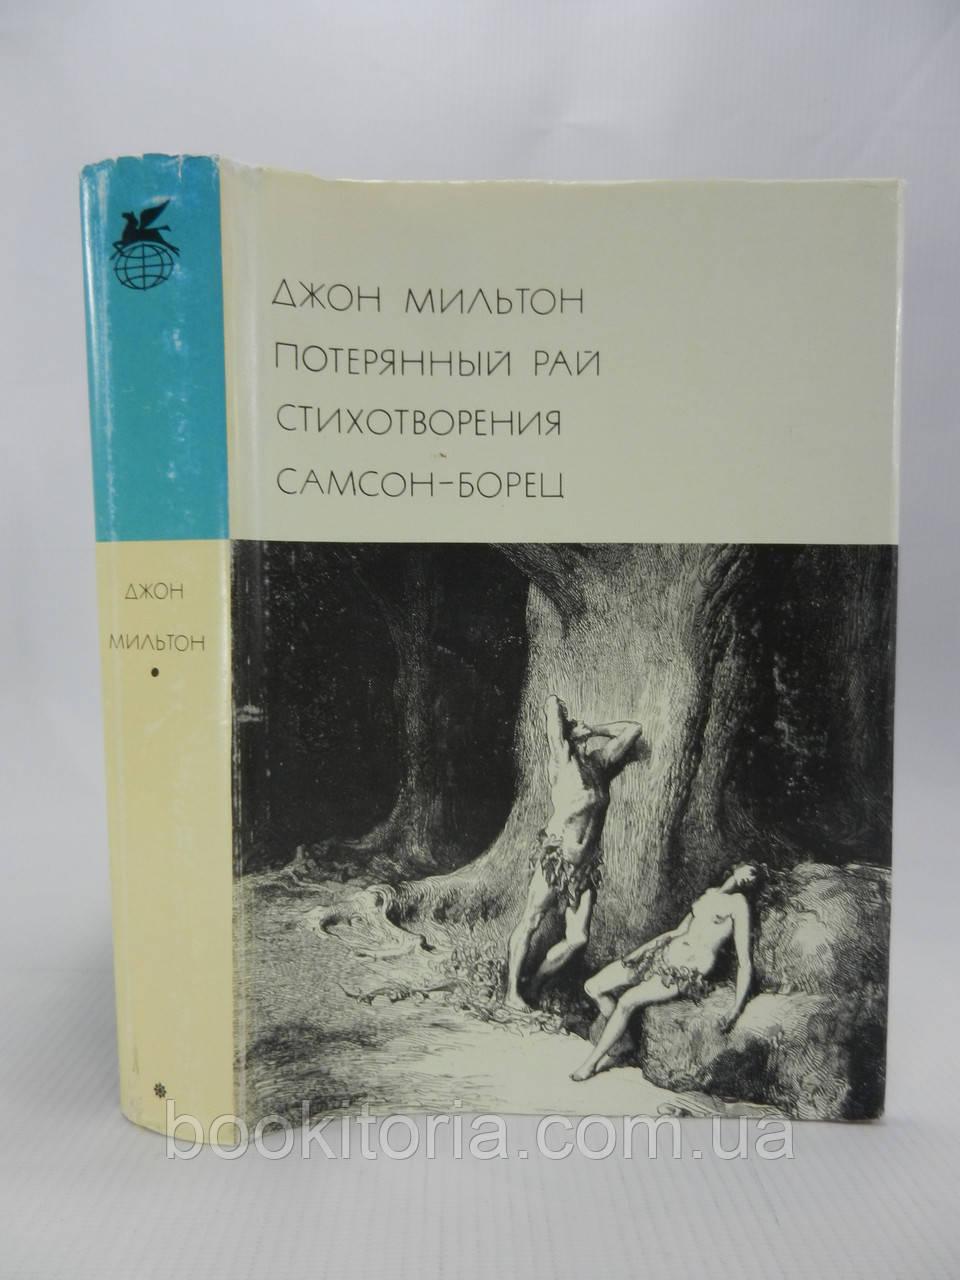 Мильтон Дж. Потерянный рай. Стихотворения. Самсон-борец (б/у).